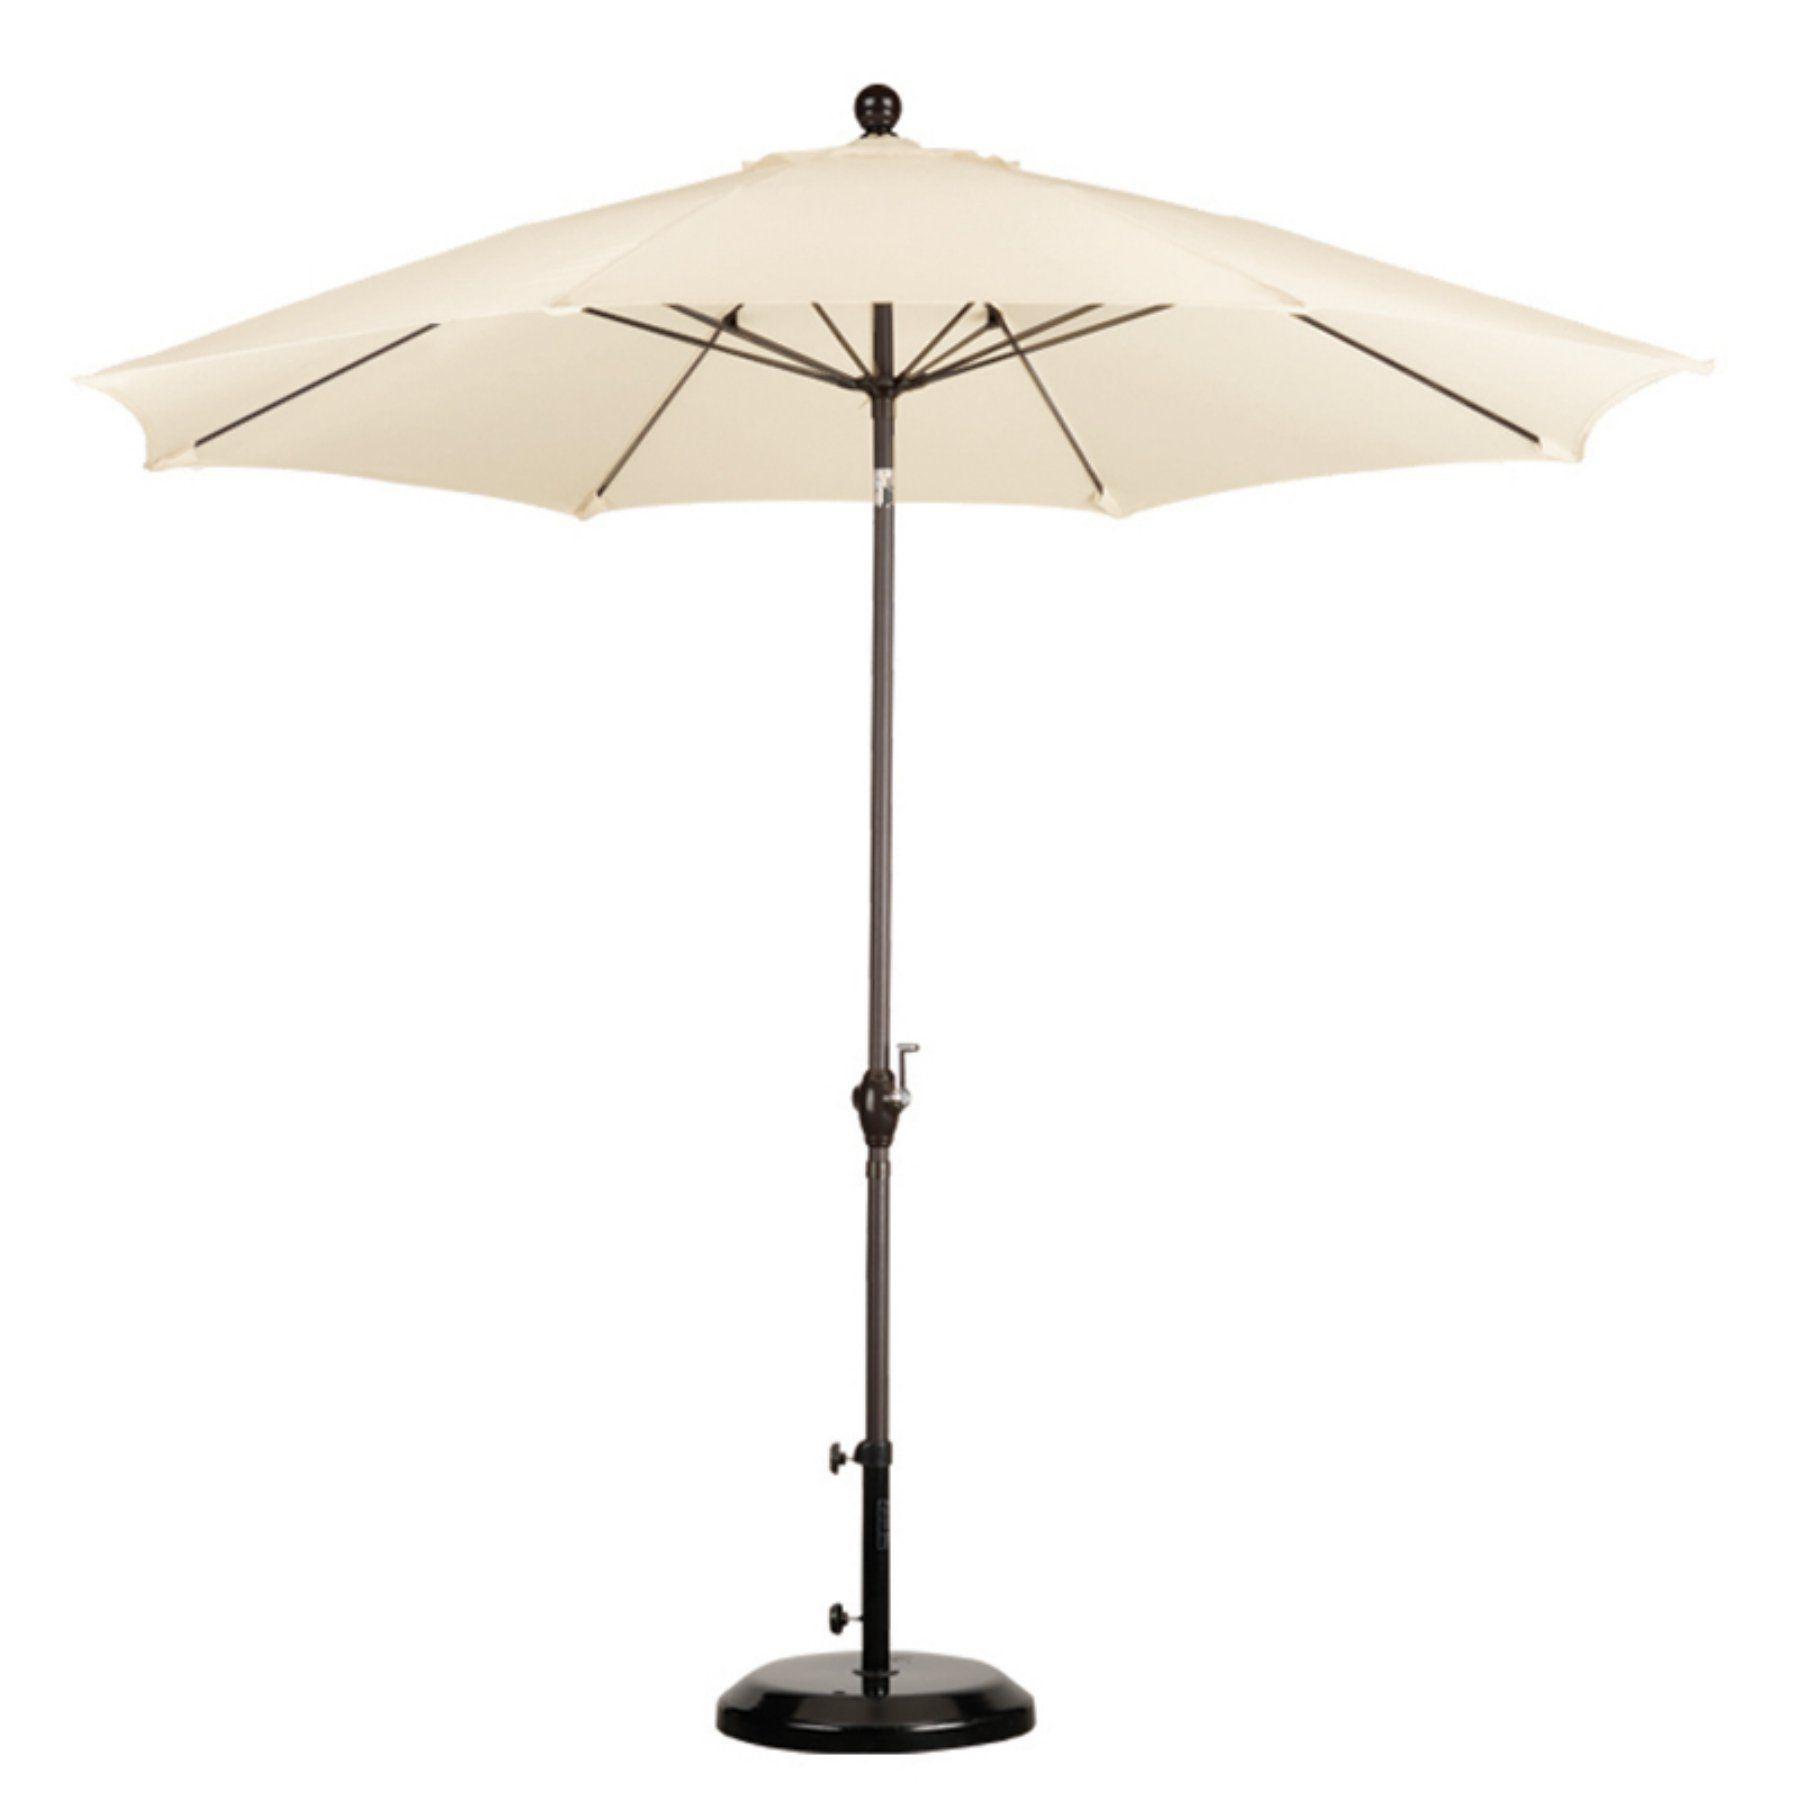 wind resistant patio umbrellas ideas